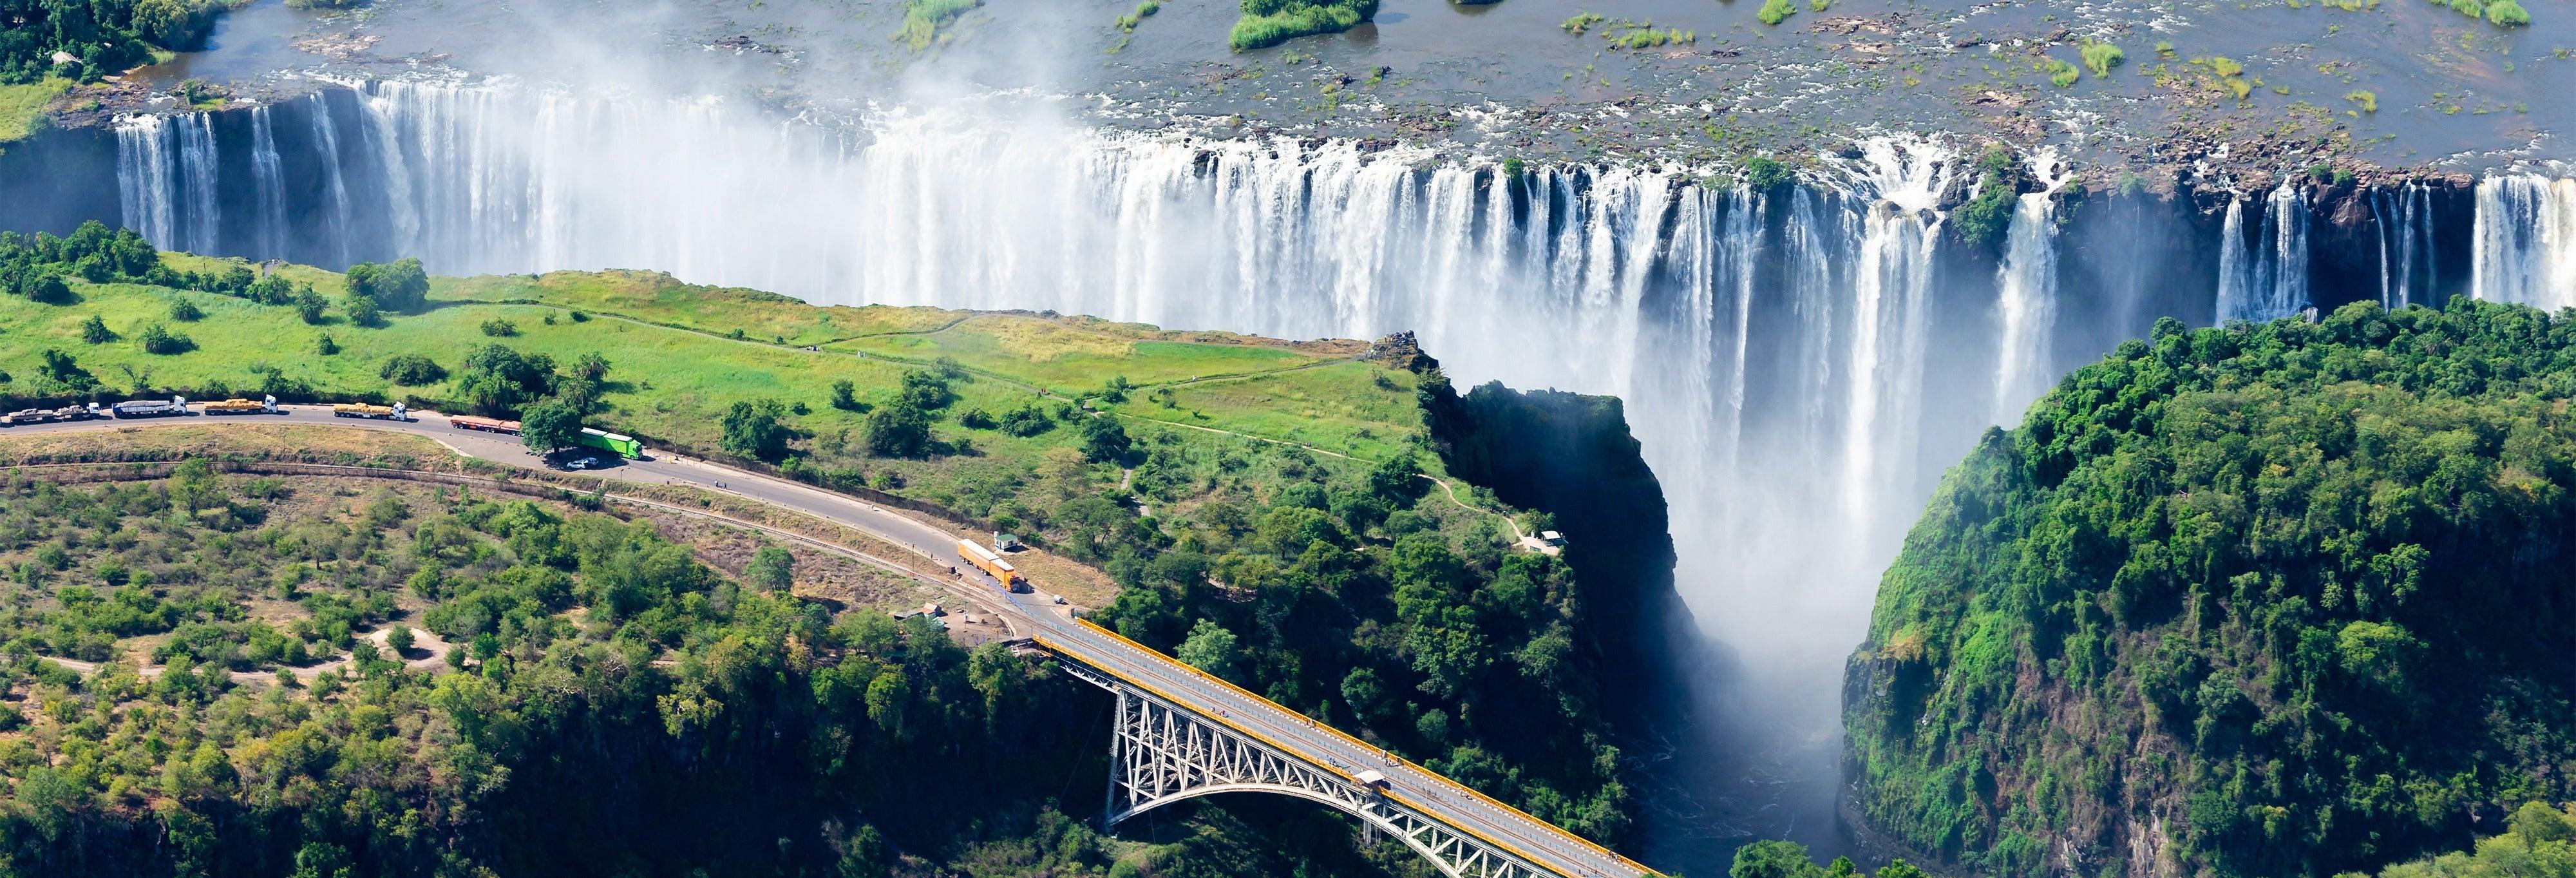 Gorge swing em Victoria Falls